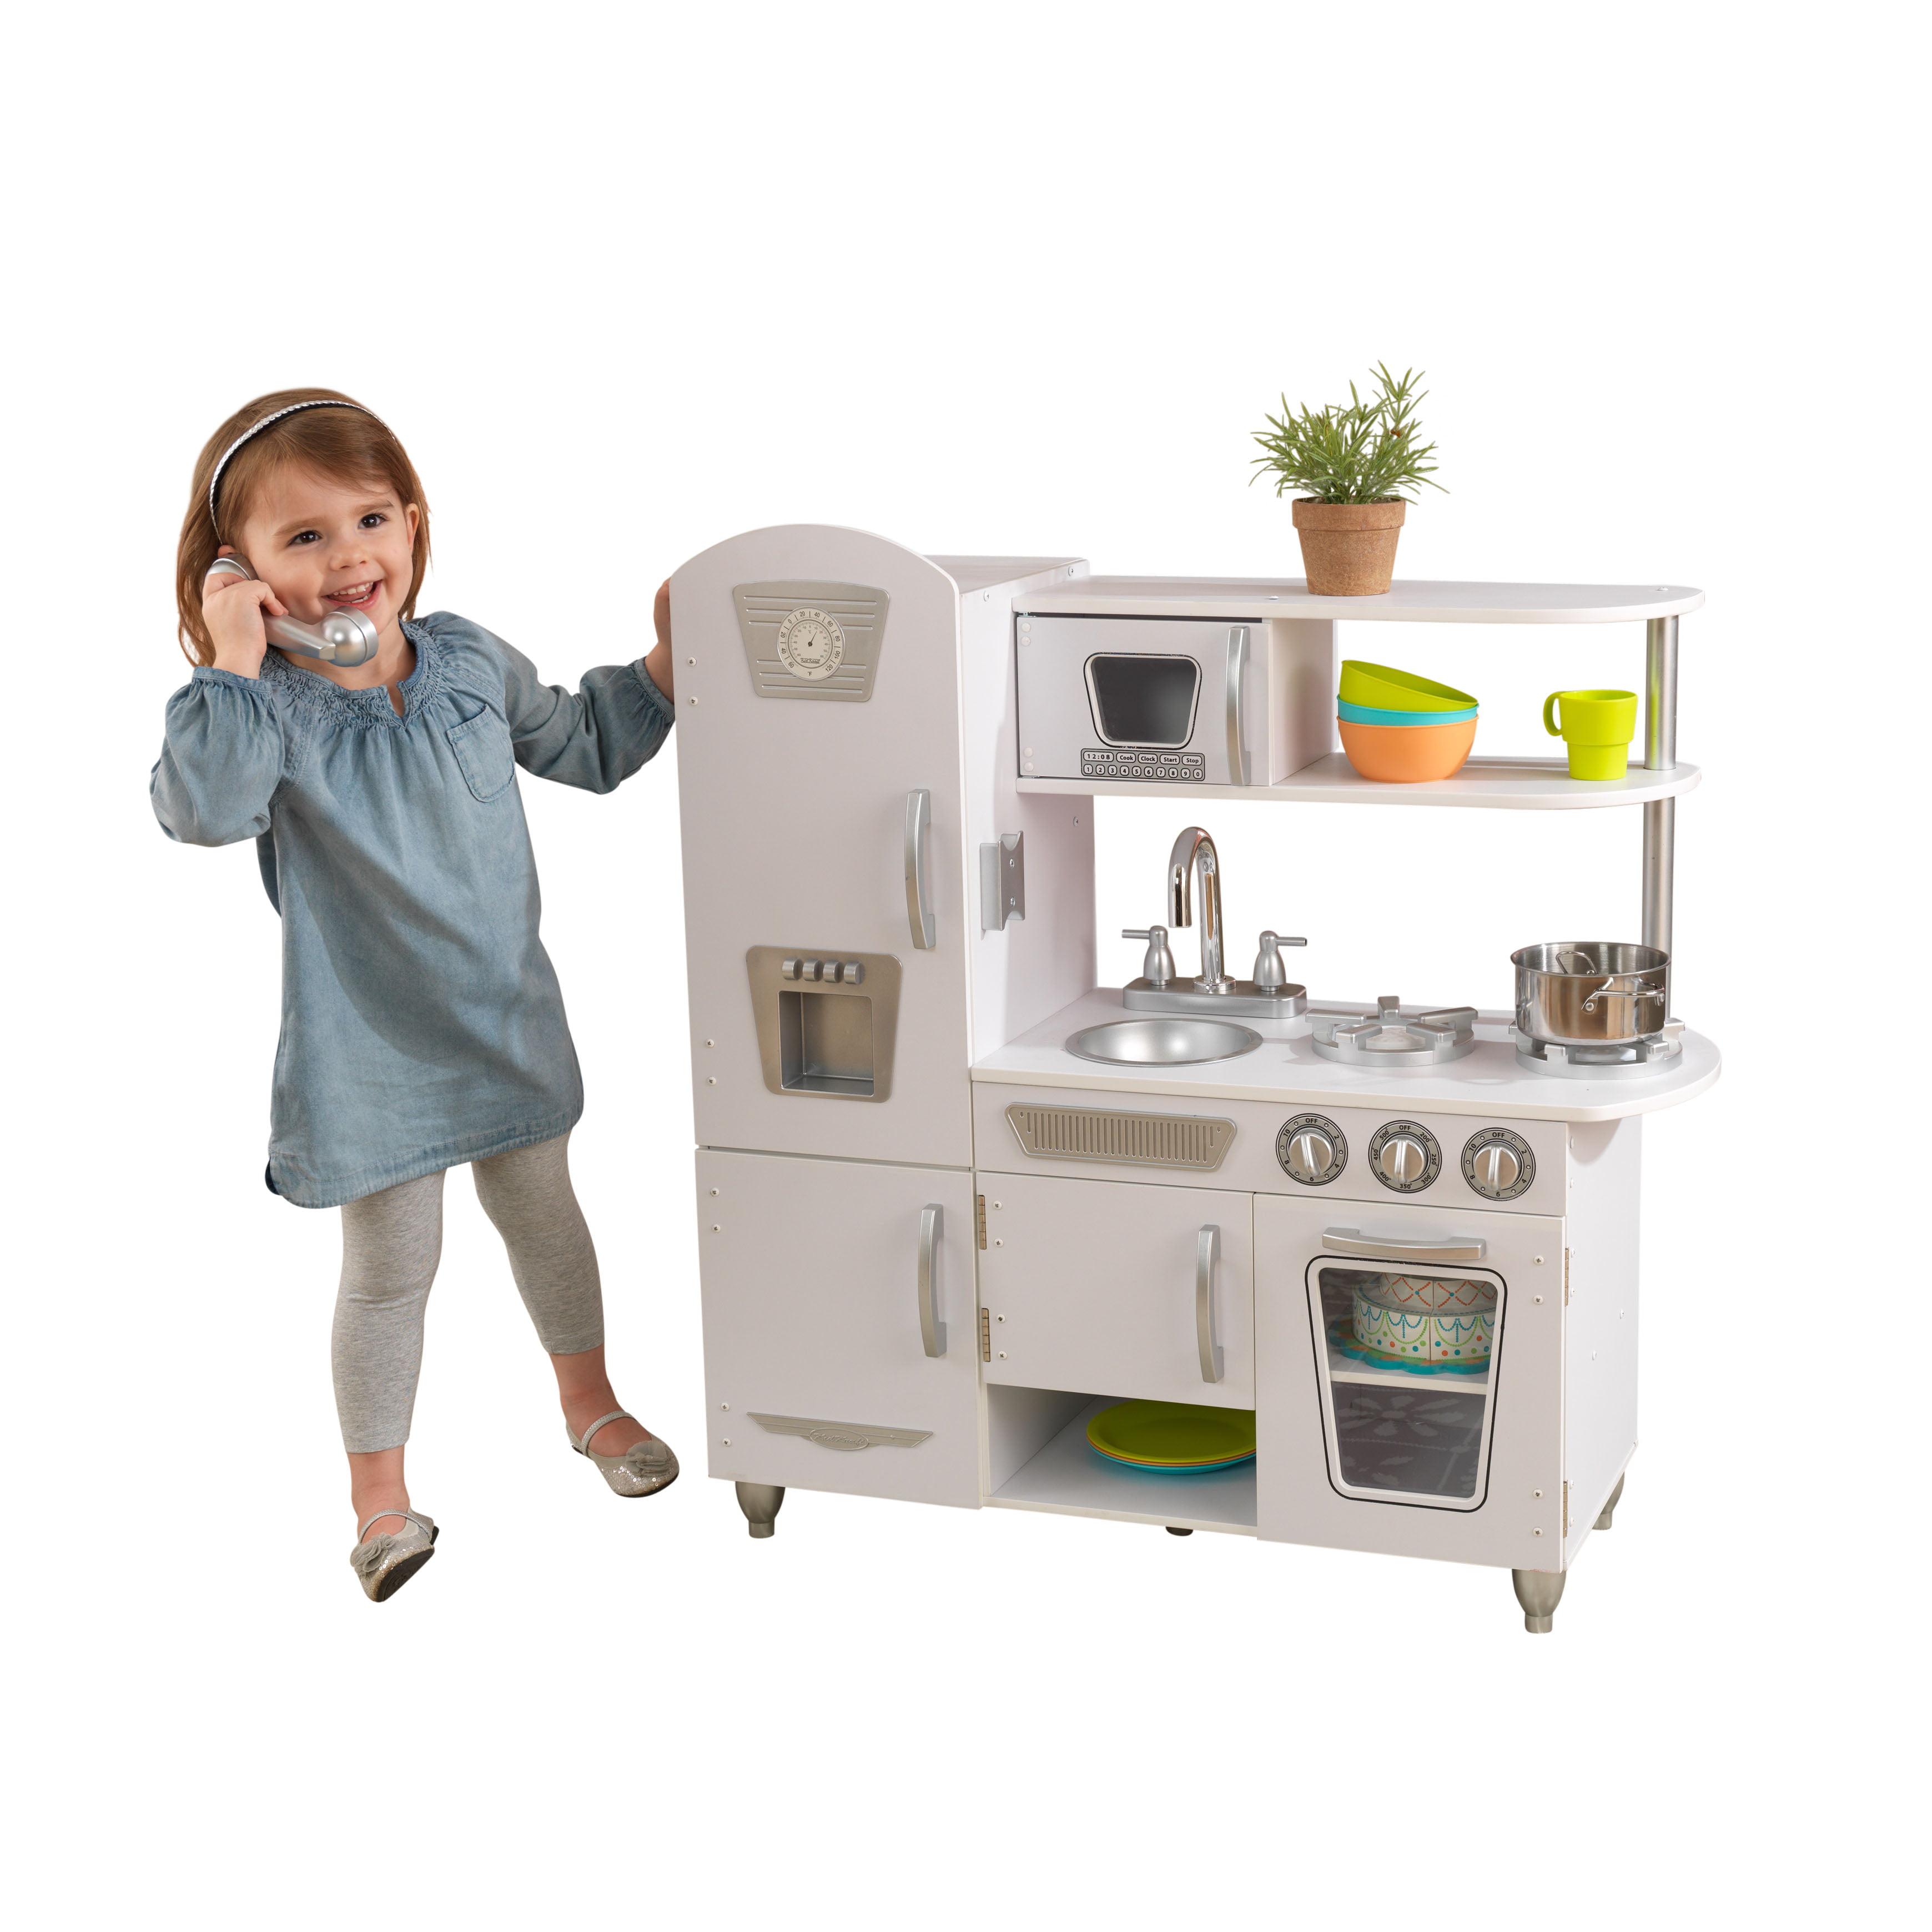 KidKraft Vintage Play Kitchen, White KidKraft Kitchen